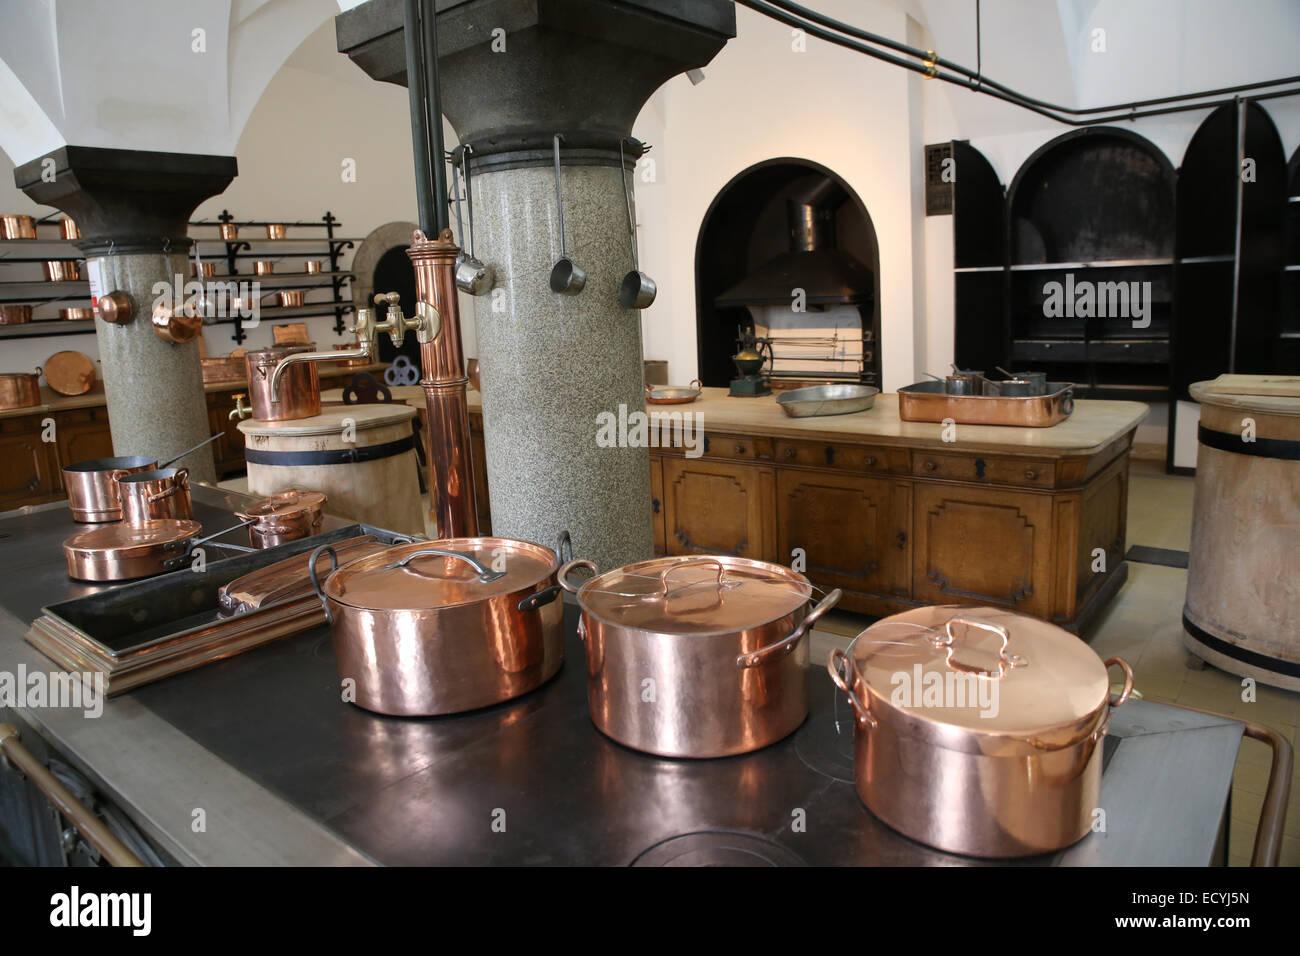 RPG OAB AD <33 Old-19th-century-german-kitchen-display-inside-neuschwanstein-castle-ECYJ5N